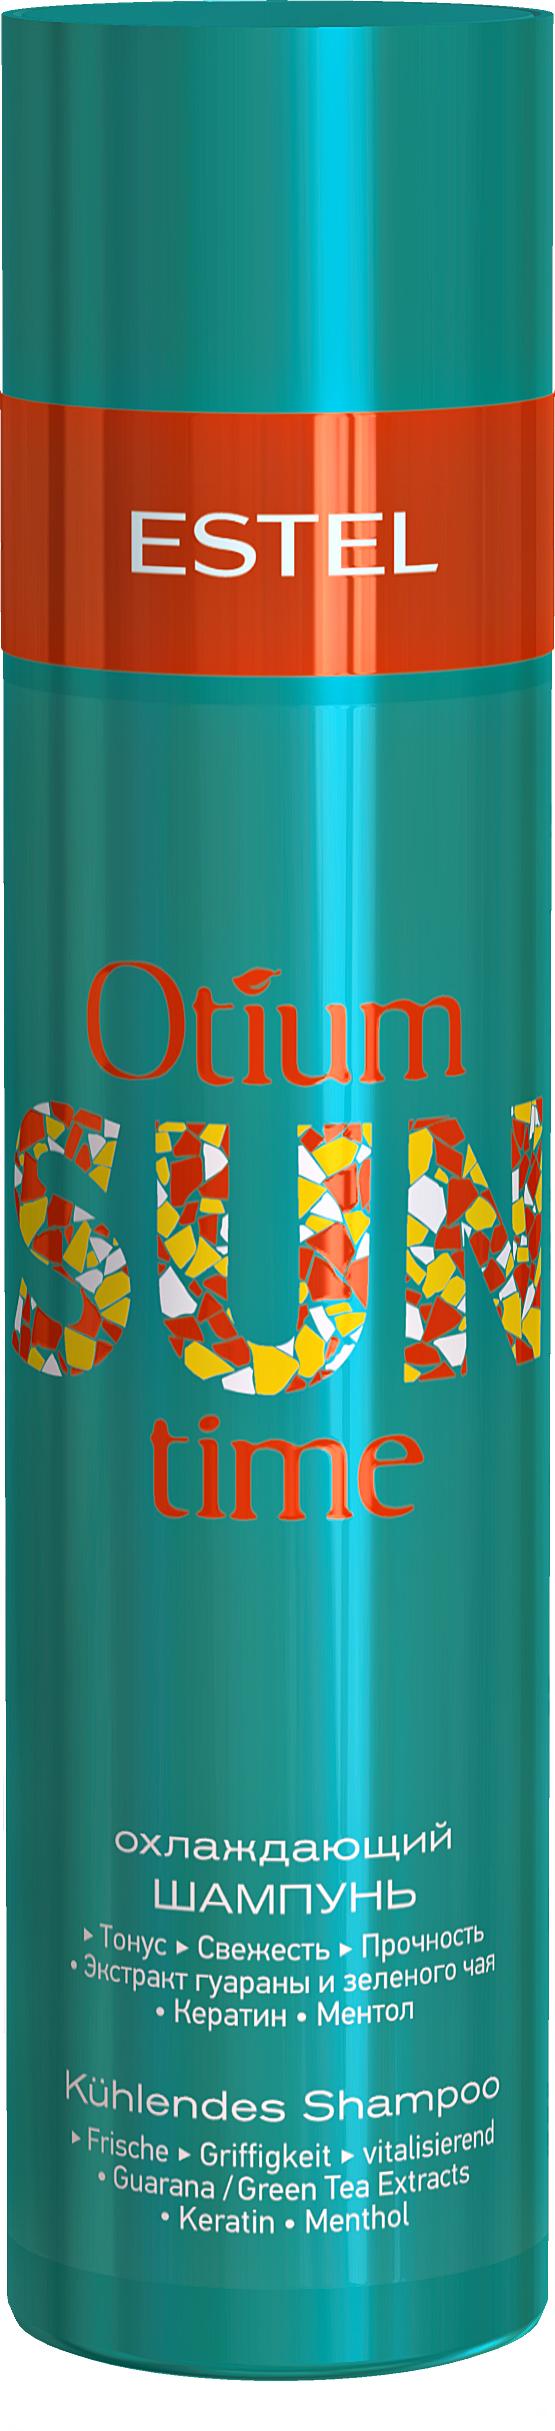 ESTEL PROFESSIONAL Шампунь охлаждающий для волос / OTIUM SUN TIME 250 мл